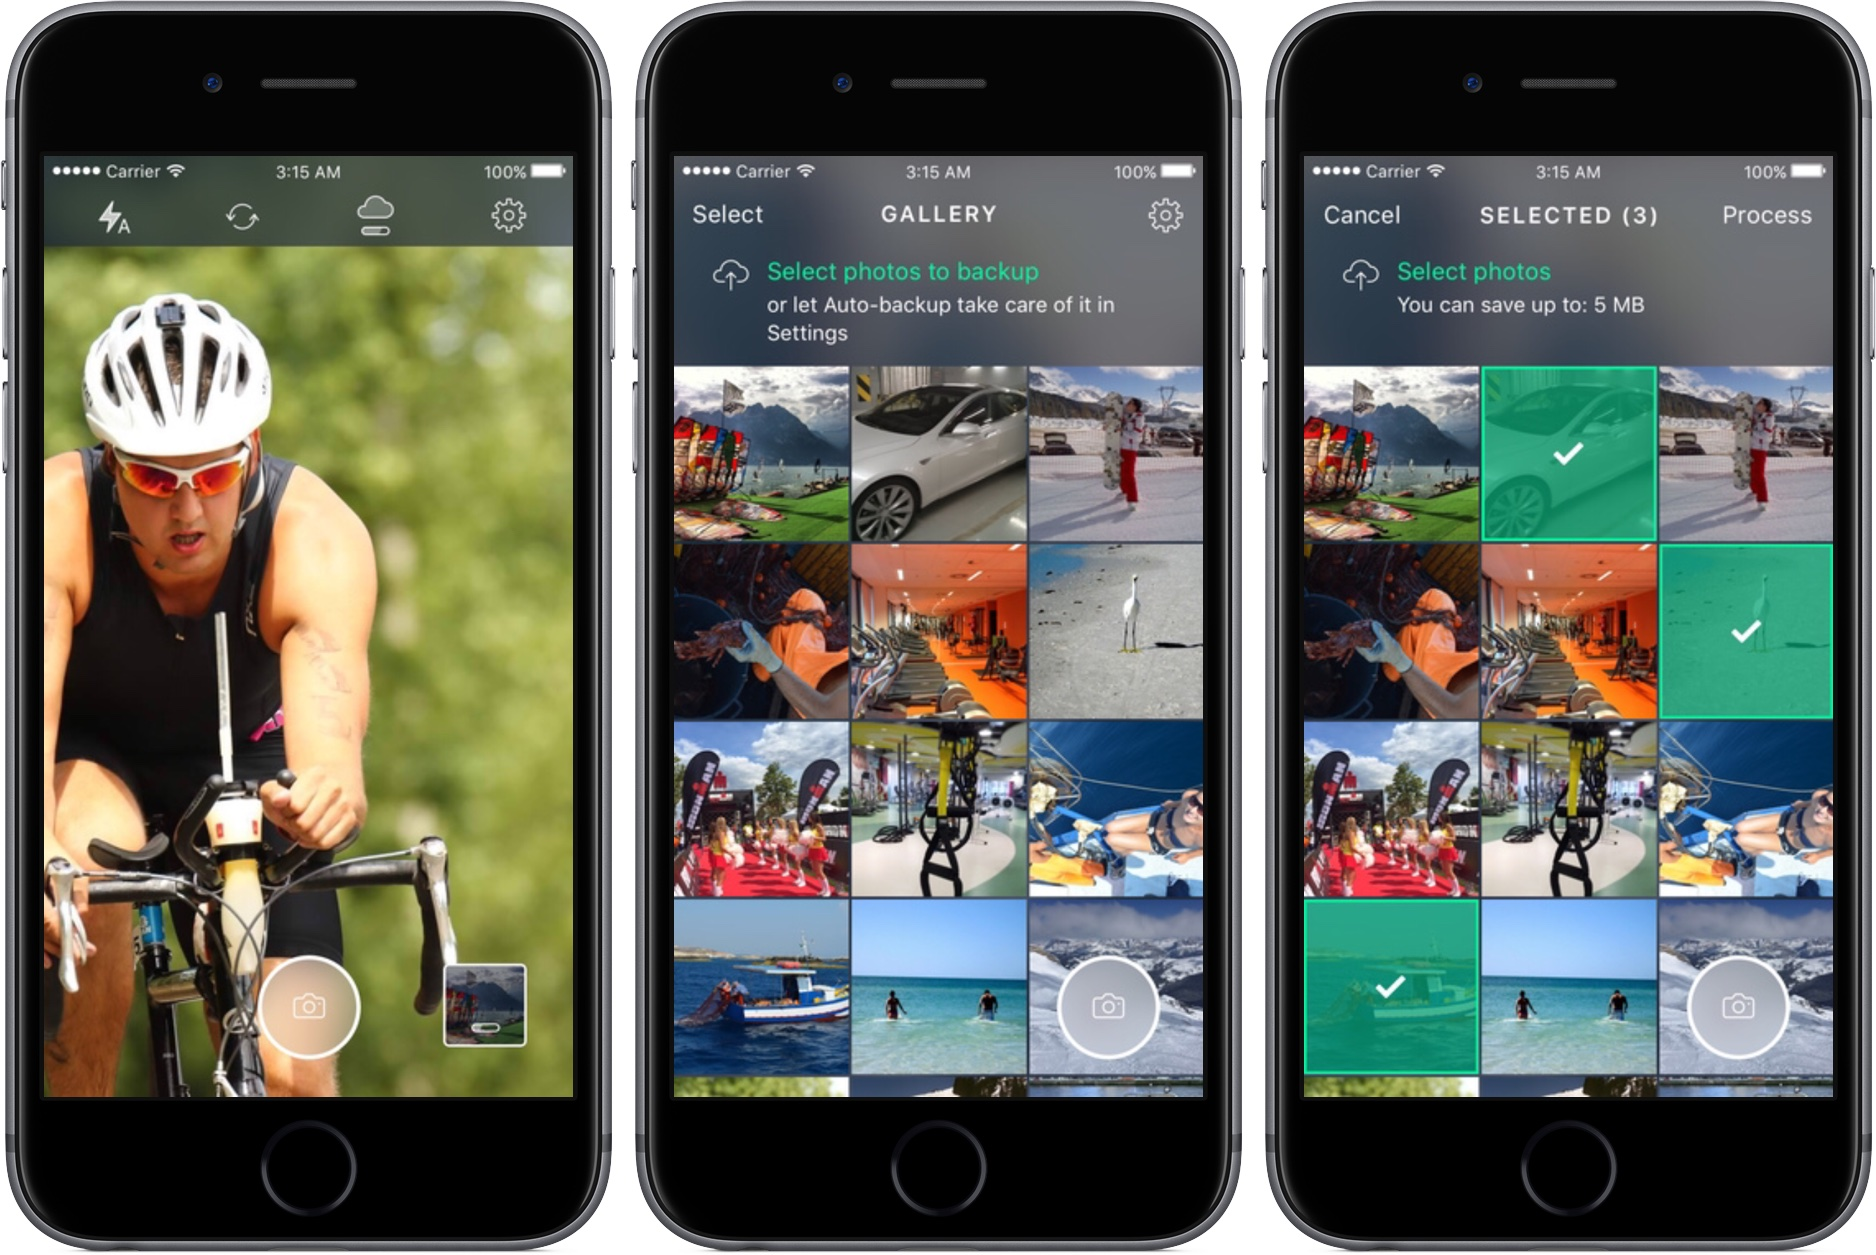 Avast Photo Space 1.0 for iOS iPhone screenshot 004